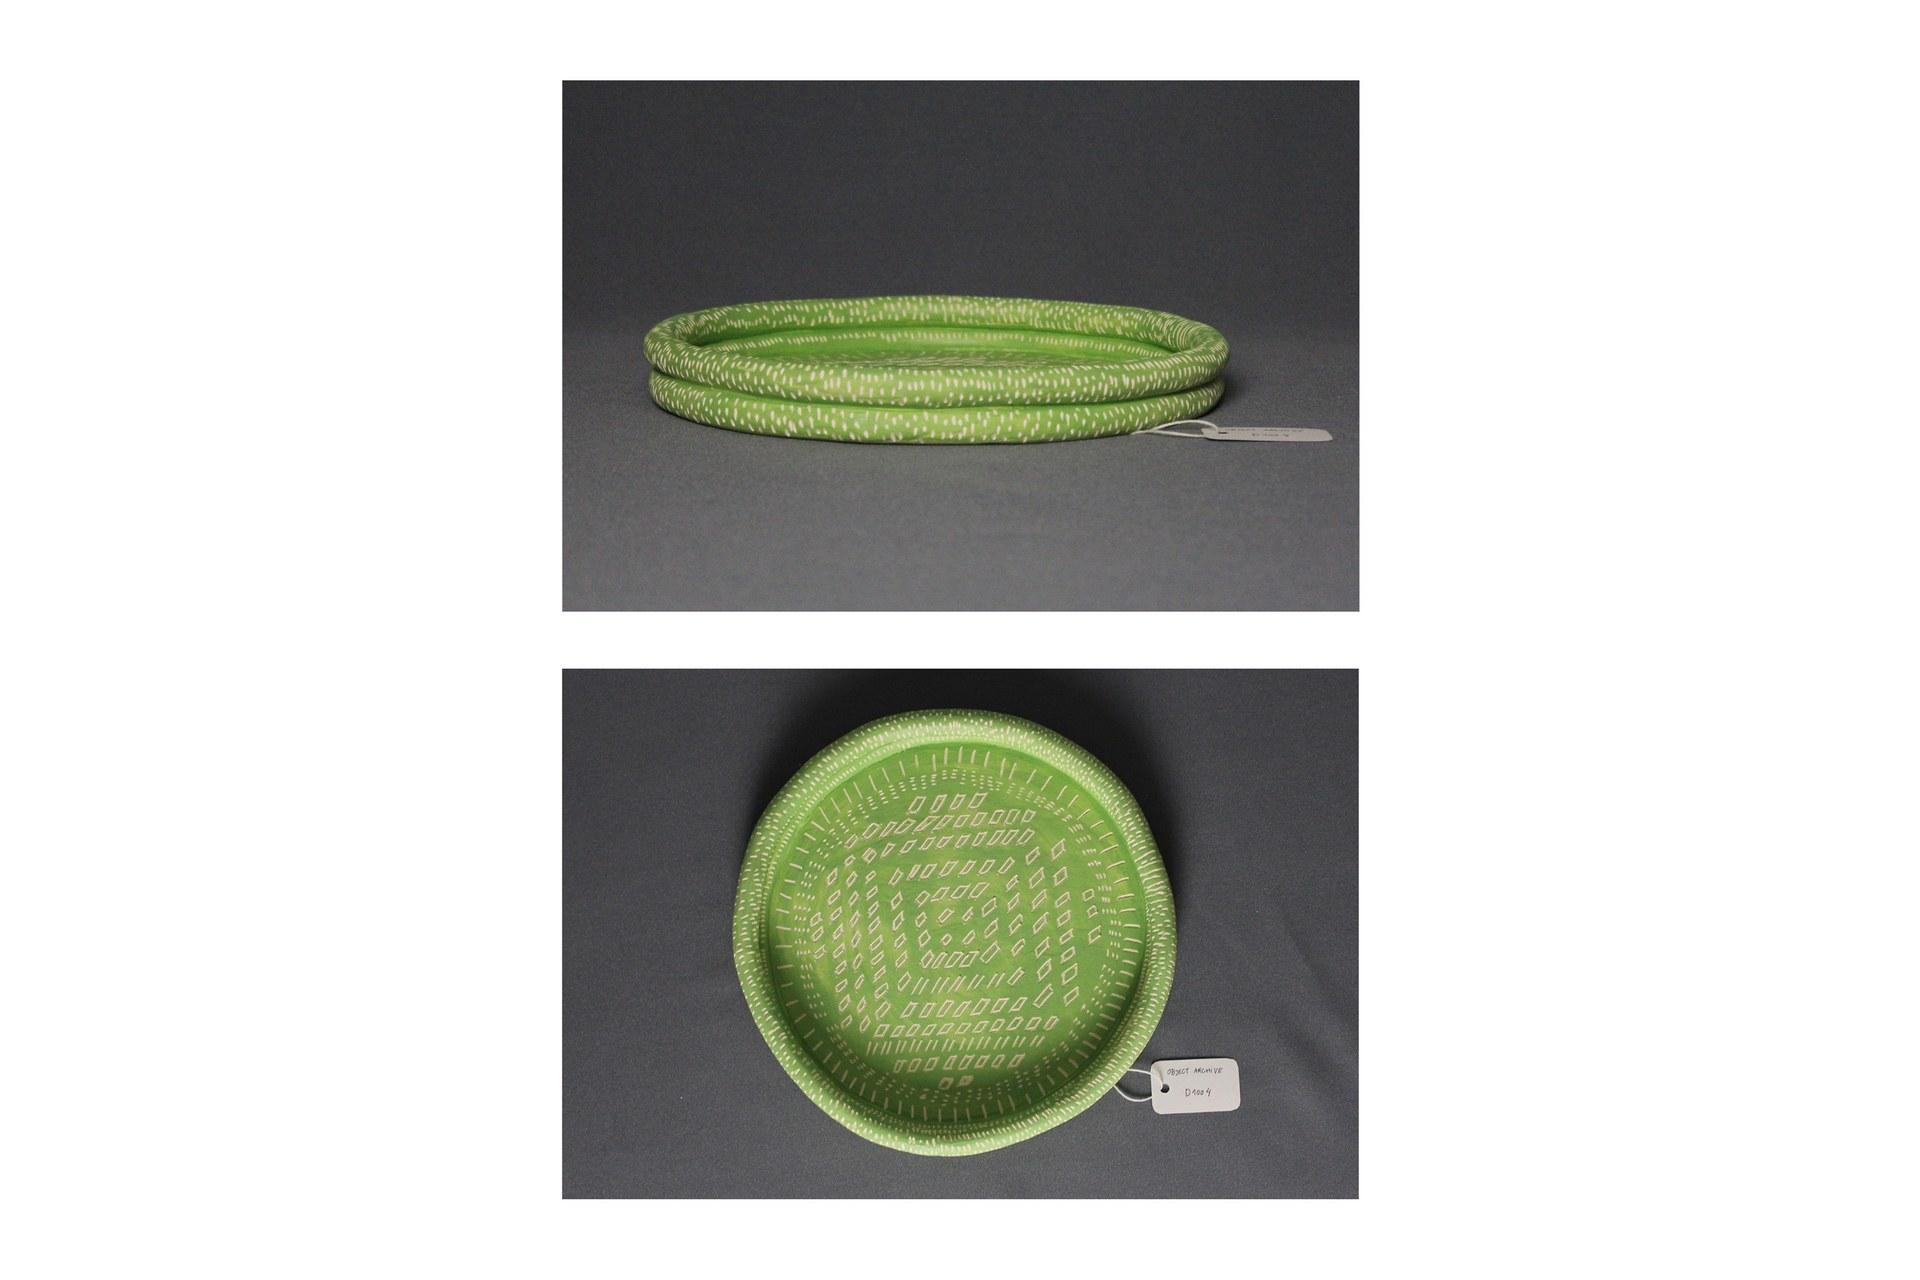 Object type: plate Archive number: D1003 Dimensions H: 3cm W: 25cm D: 25cm